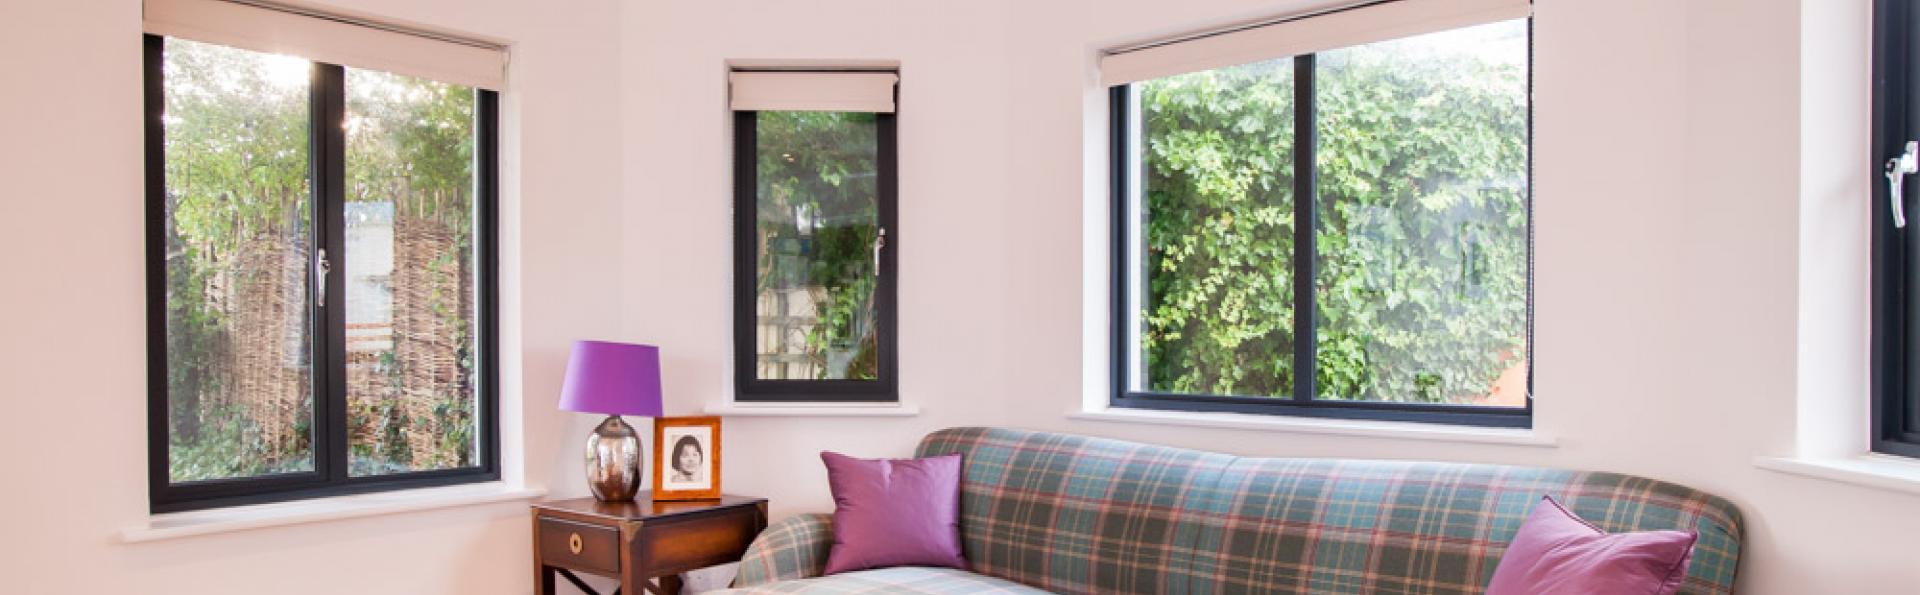 aluminium windows installed in North devon